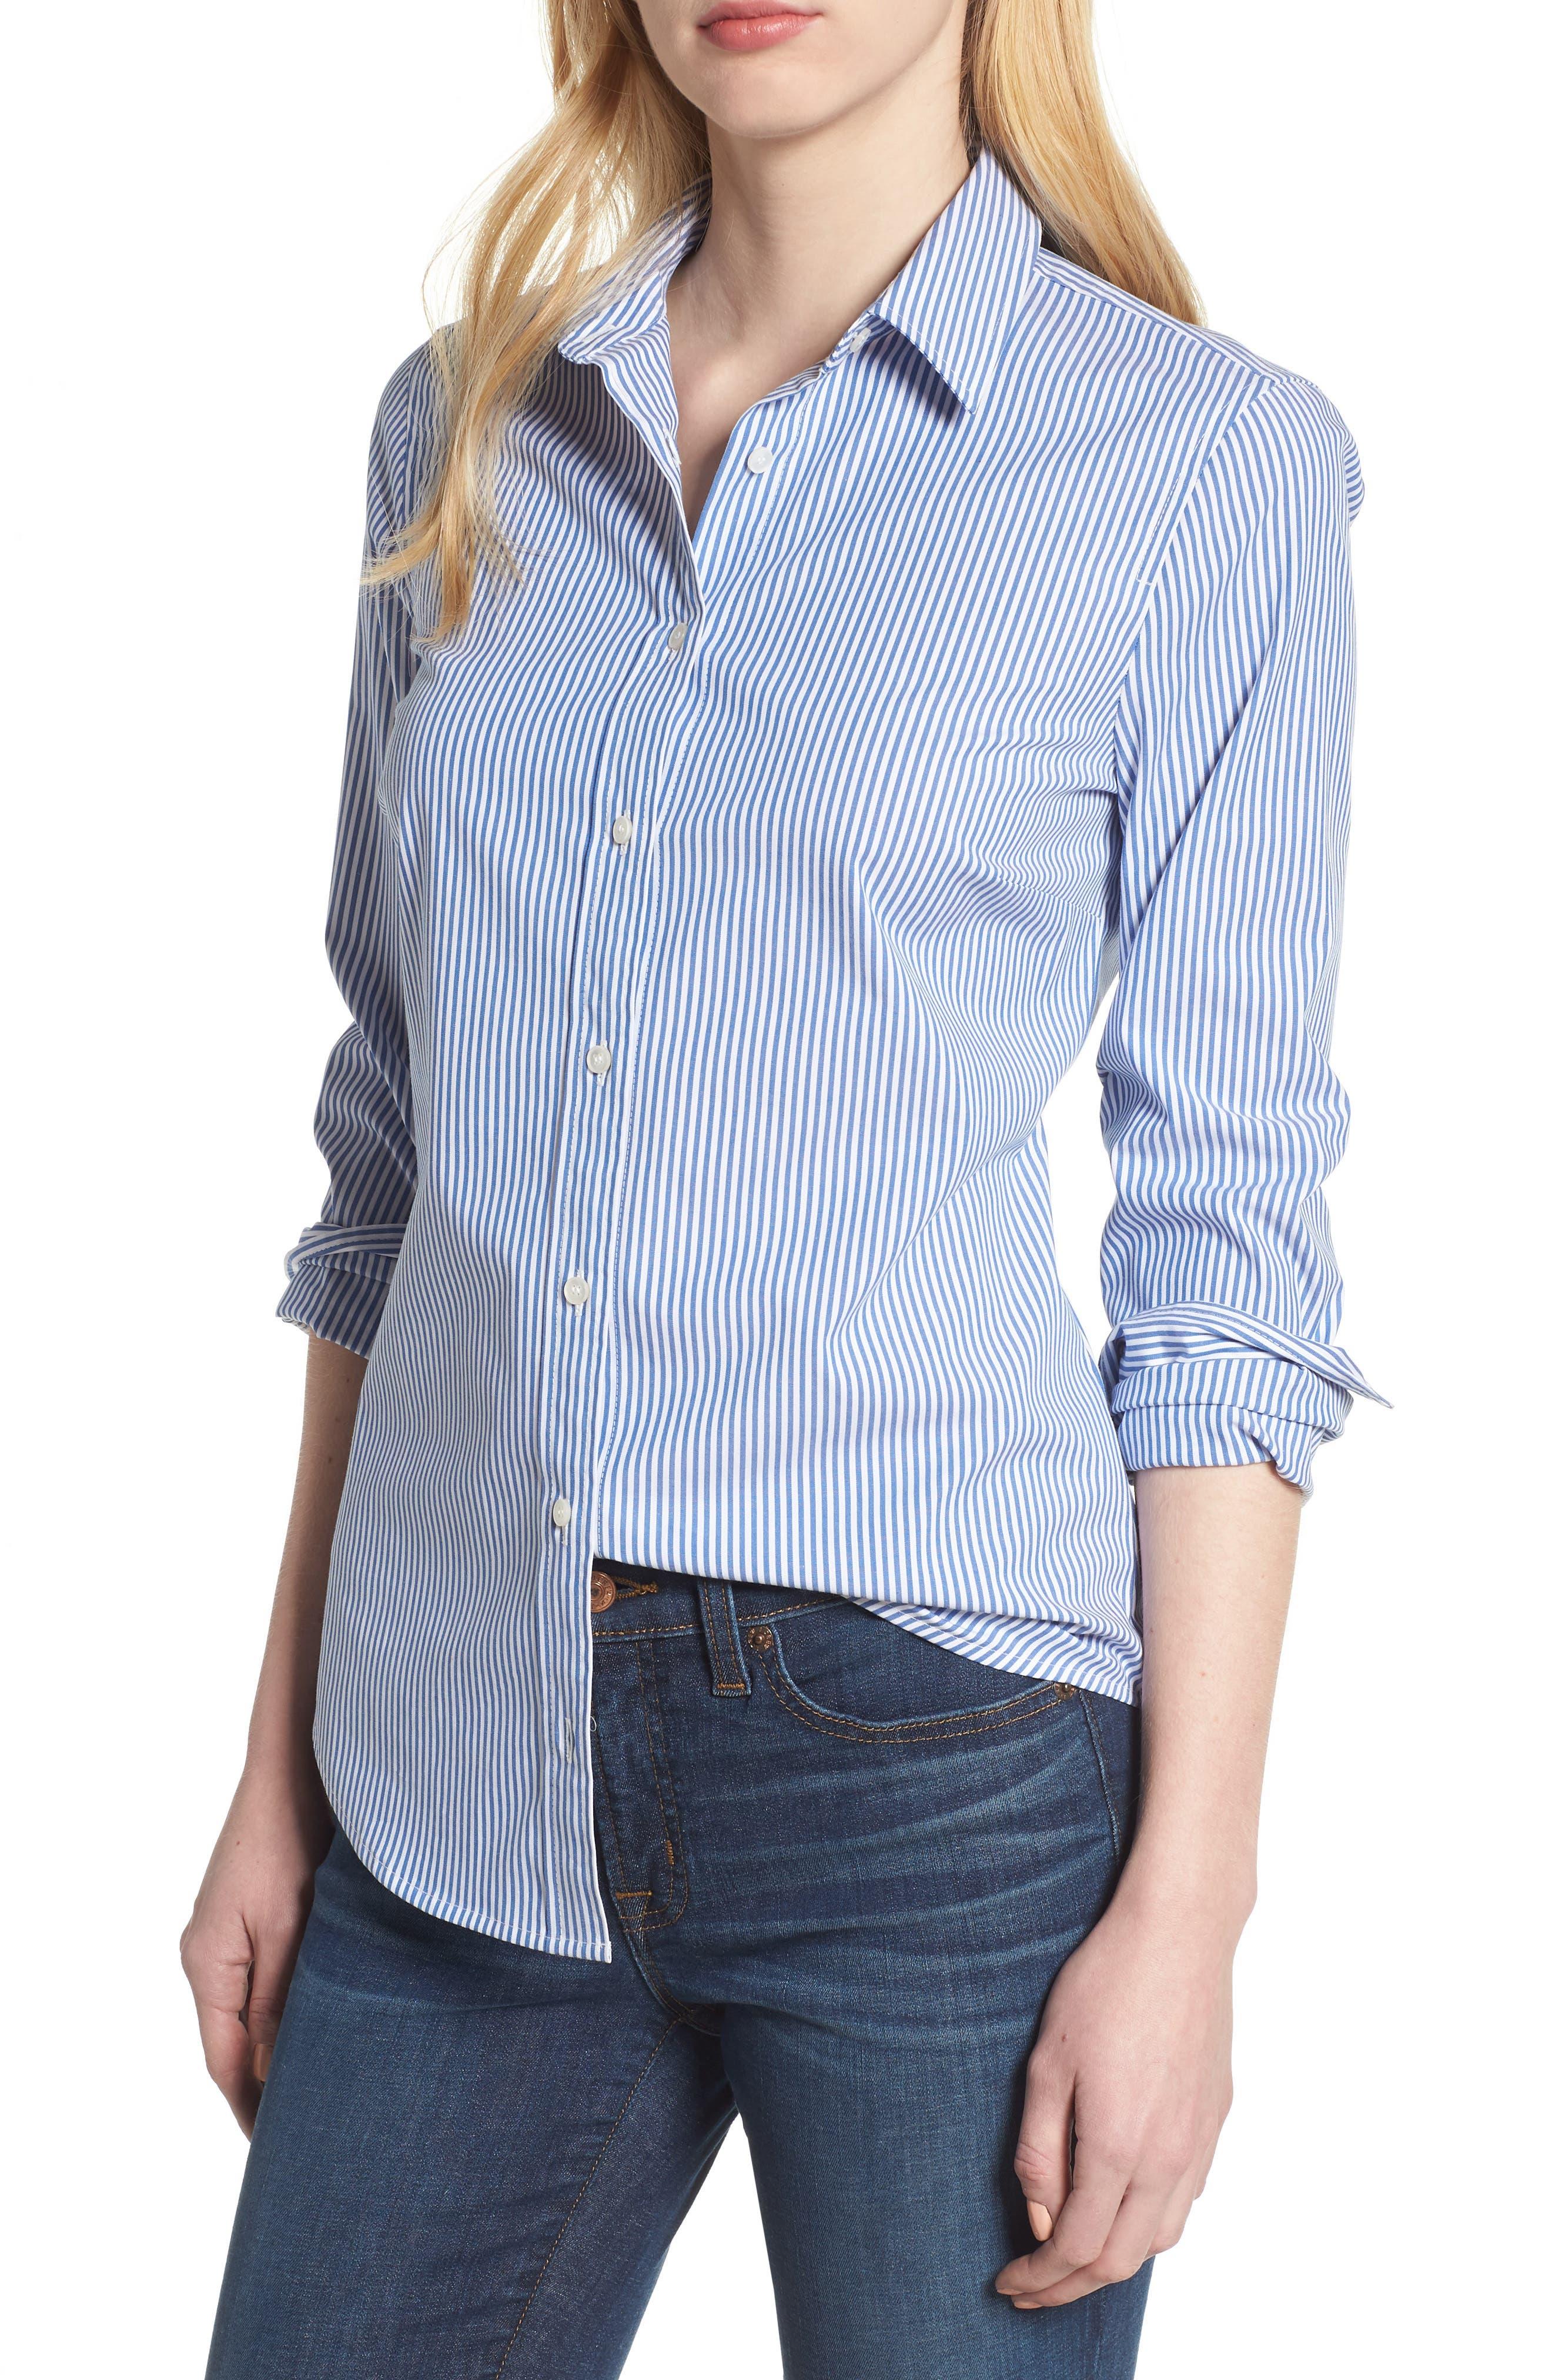 Alternate Image 1 Selected - J.Crew Perfect Classic Stripe Stretch Cotton Shirt (Regular & Petite)